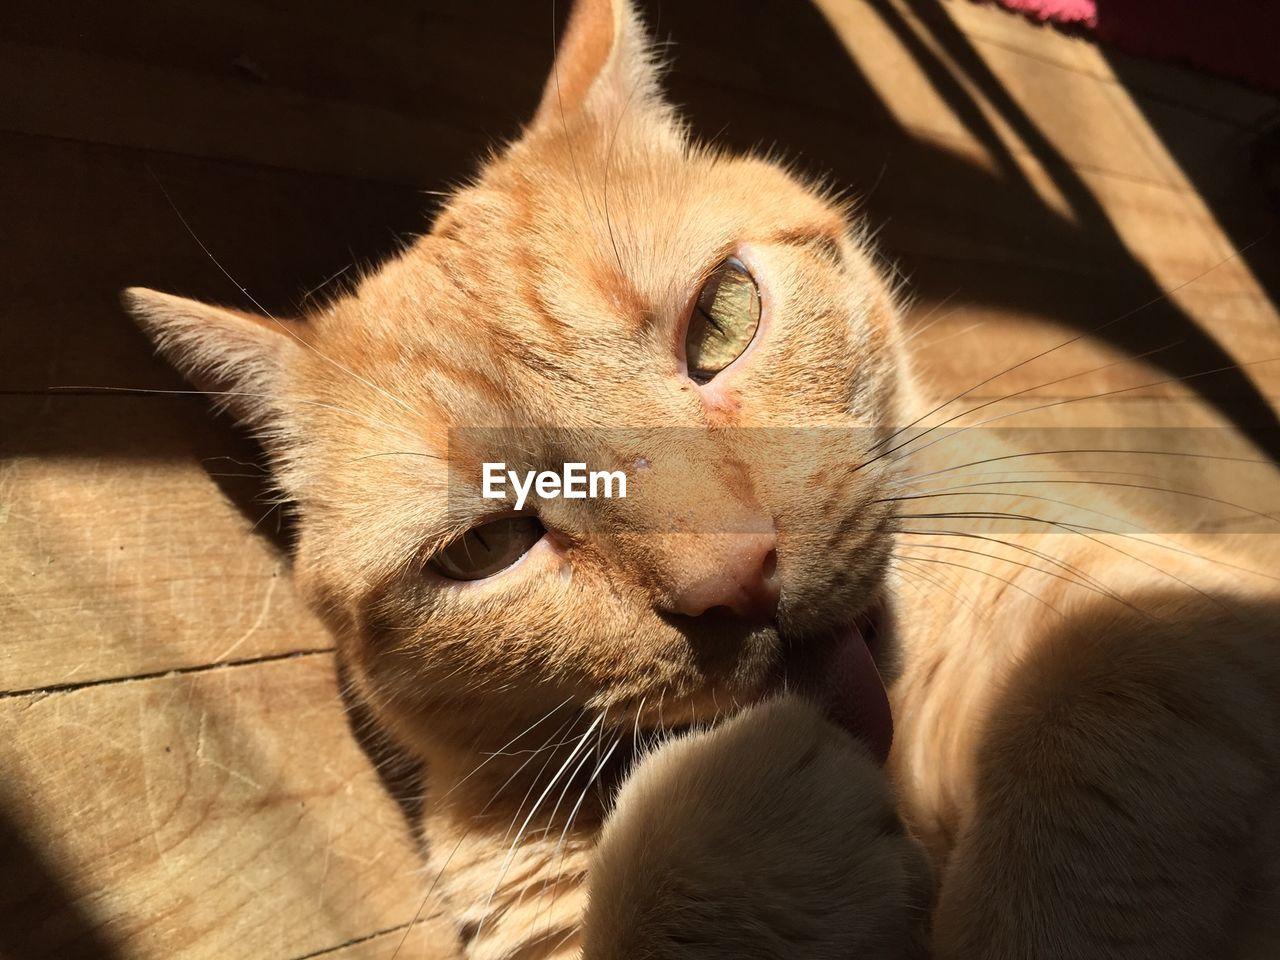 Portrait of ginger cat lying on wood